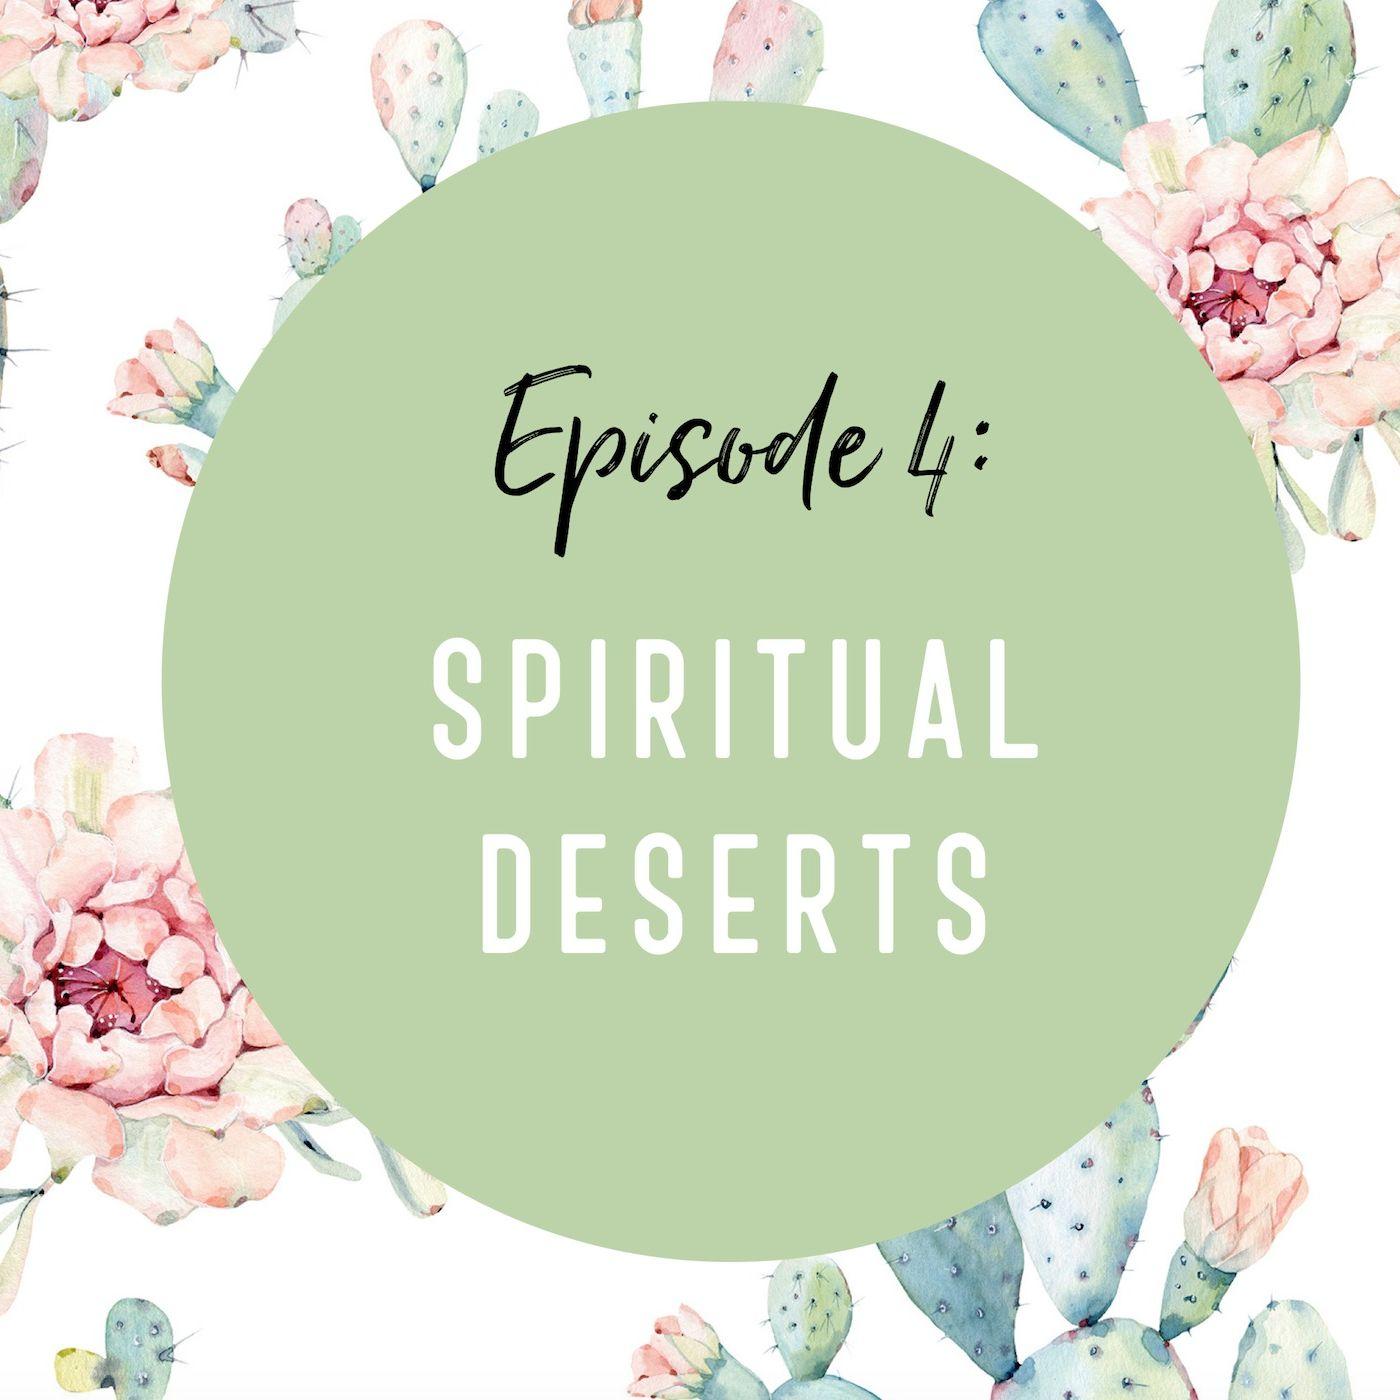 Episode 4: Spiritual Deserts